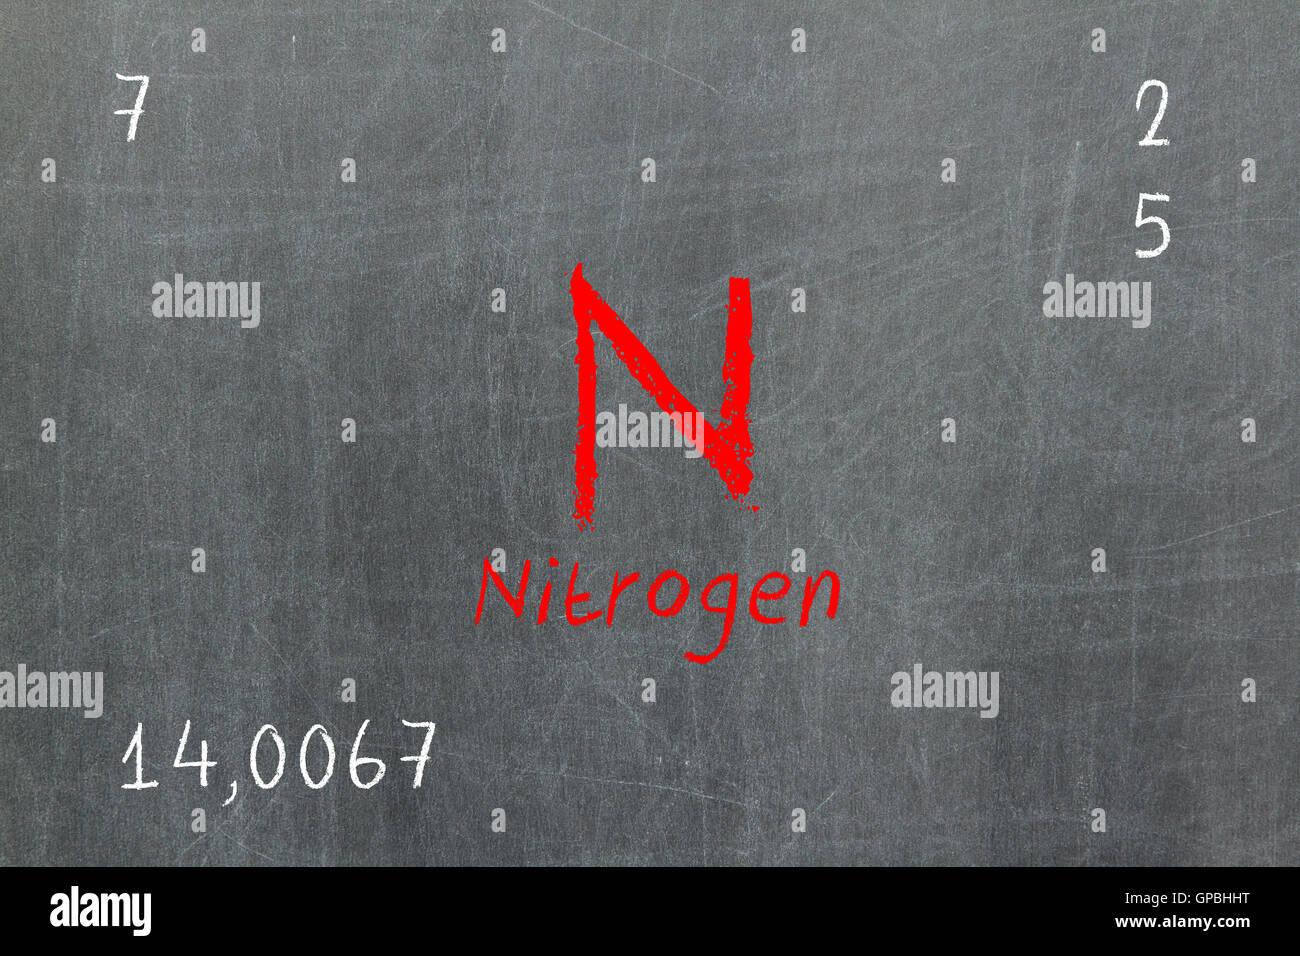 Isolated blackboard with periodic table nitrogen stock photo isolated blackboard with periodic table nitrogen gamestrikefo Choice Image